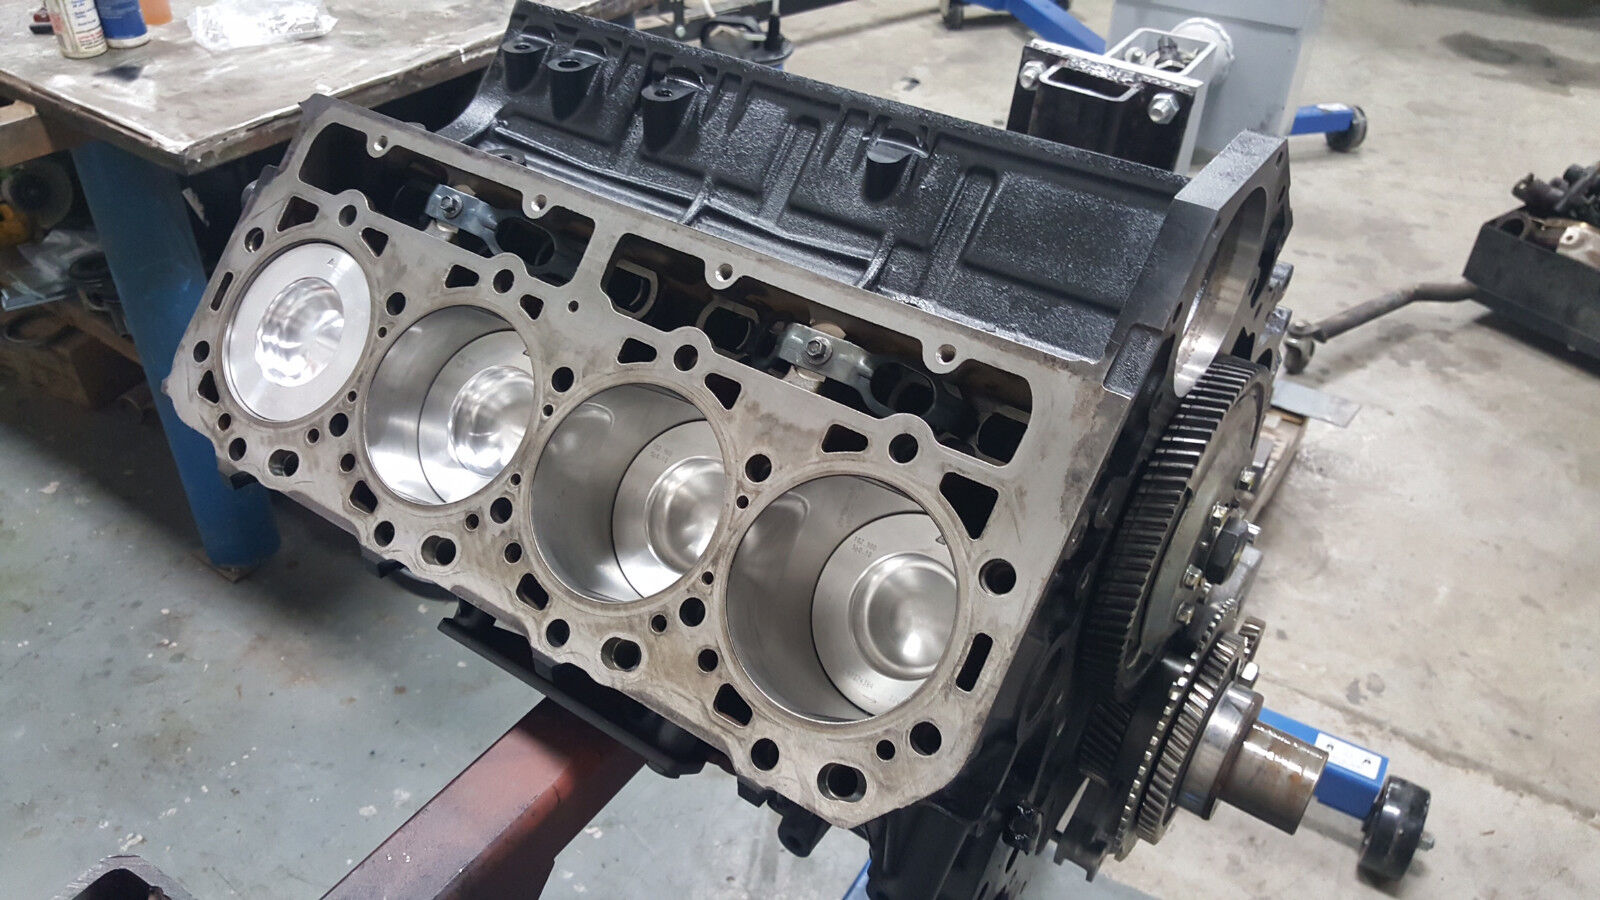 Lbz Arp Head Studs Basement Wall Gm Duramax Sel Engine 5 Of 11 Reman 6 Long Block Lmm